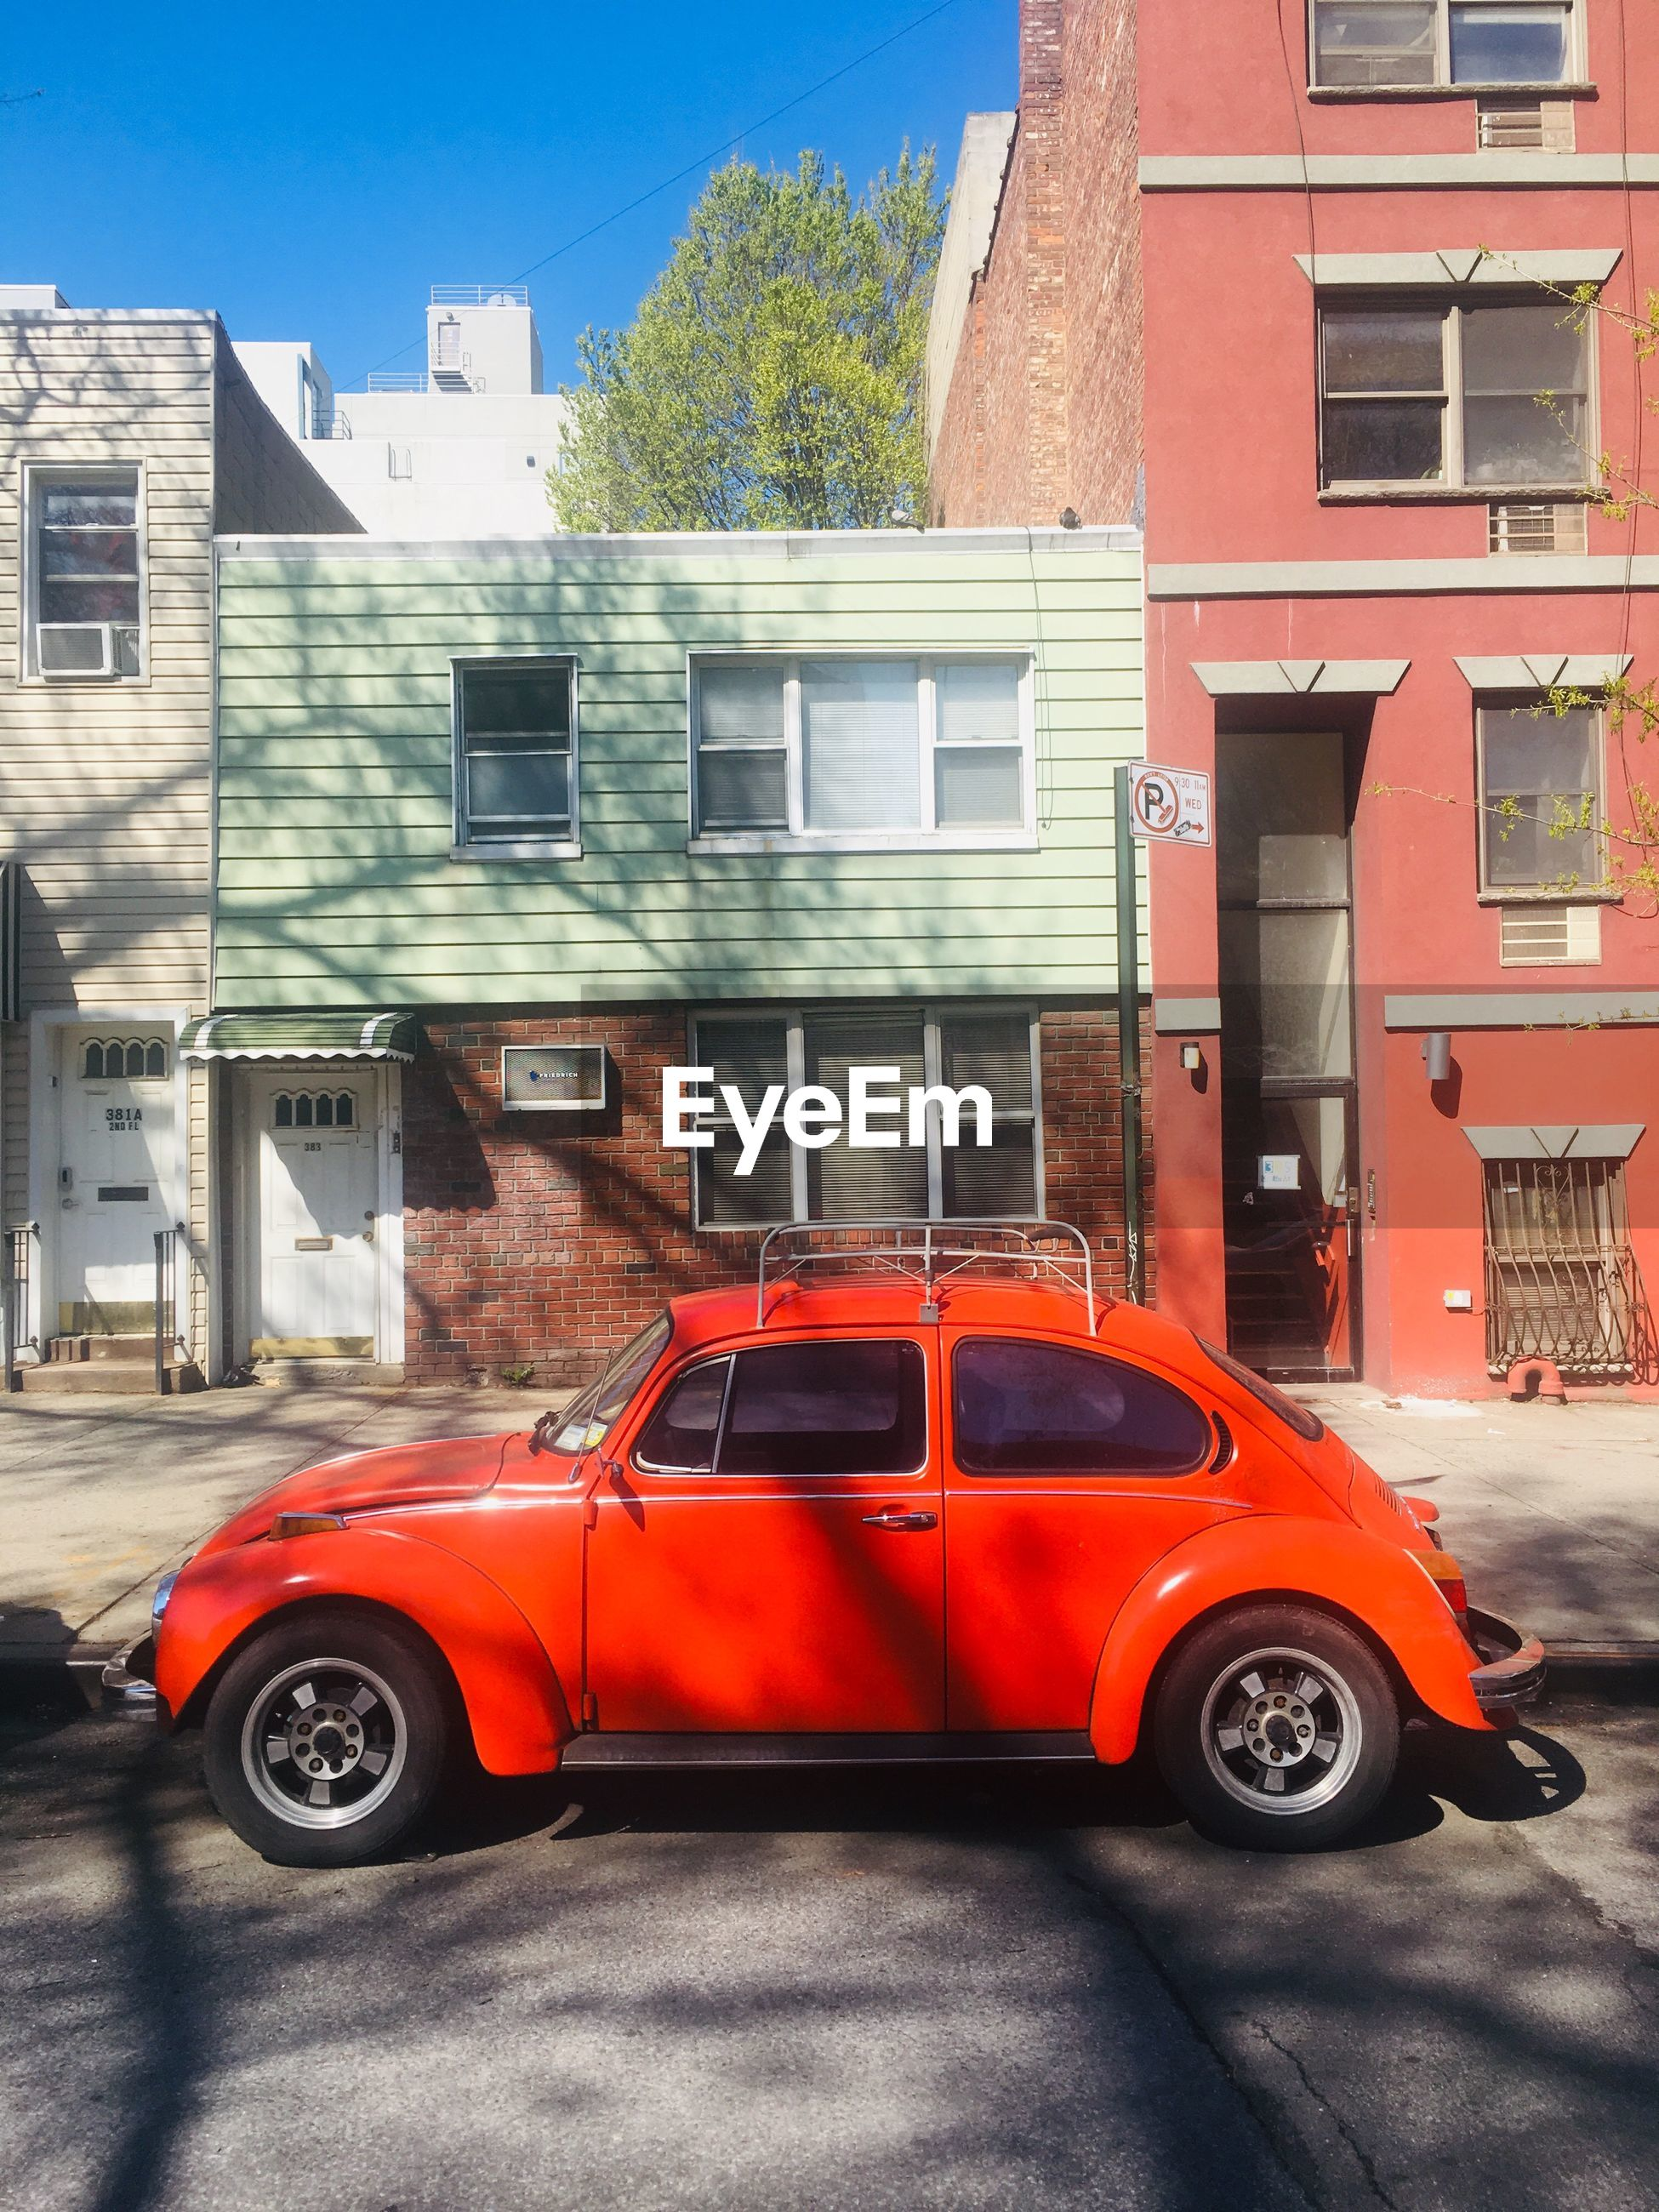 RED CAR ON STREET AGAINST BUILDINGS